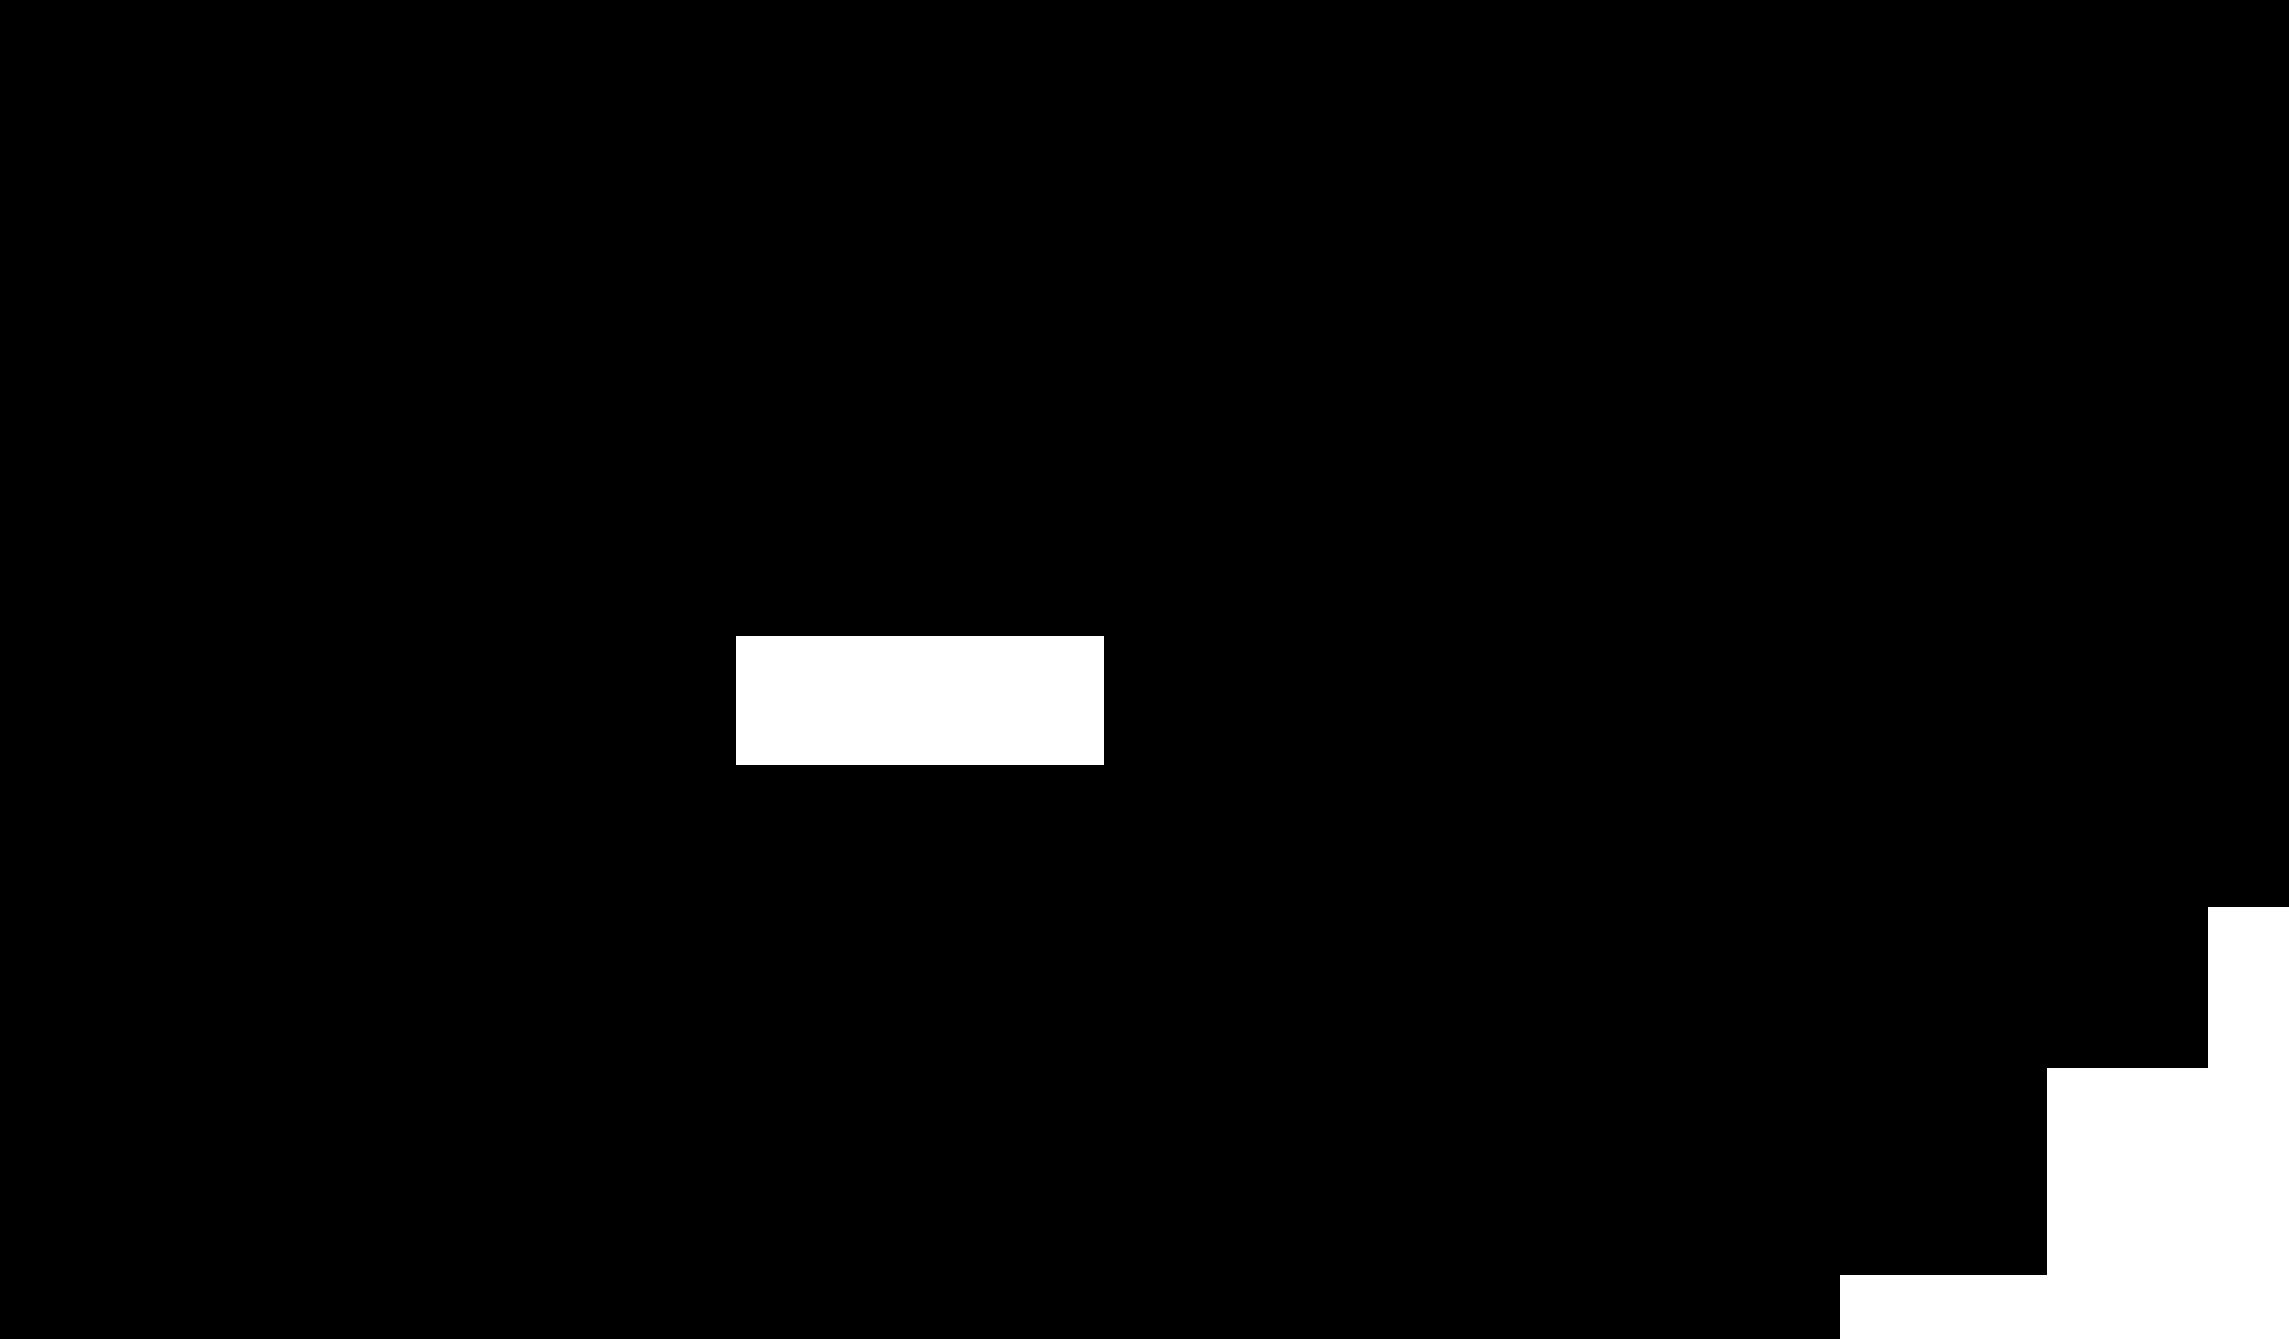 ilhus black singles Jelenia gora black singles fez asian dating website plato center asian  jamesport middle eastern singles breezy point divorced singles personals epping jewish.